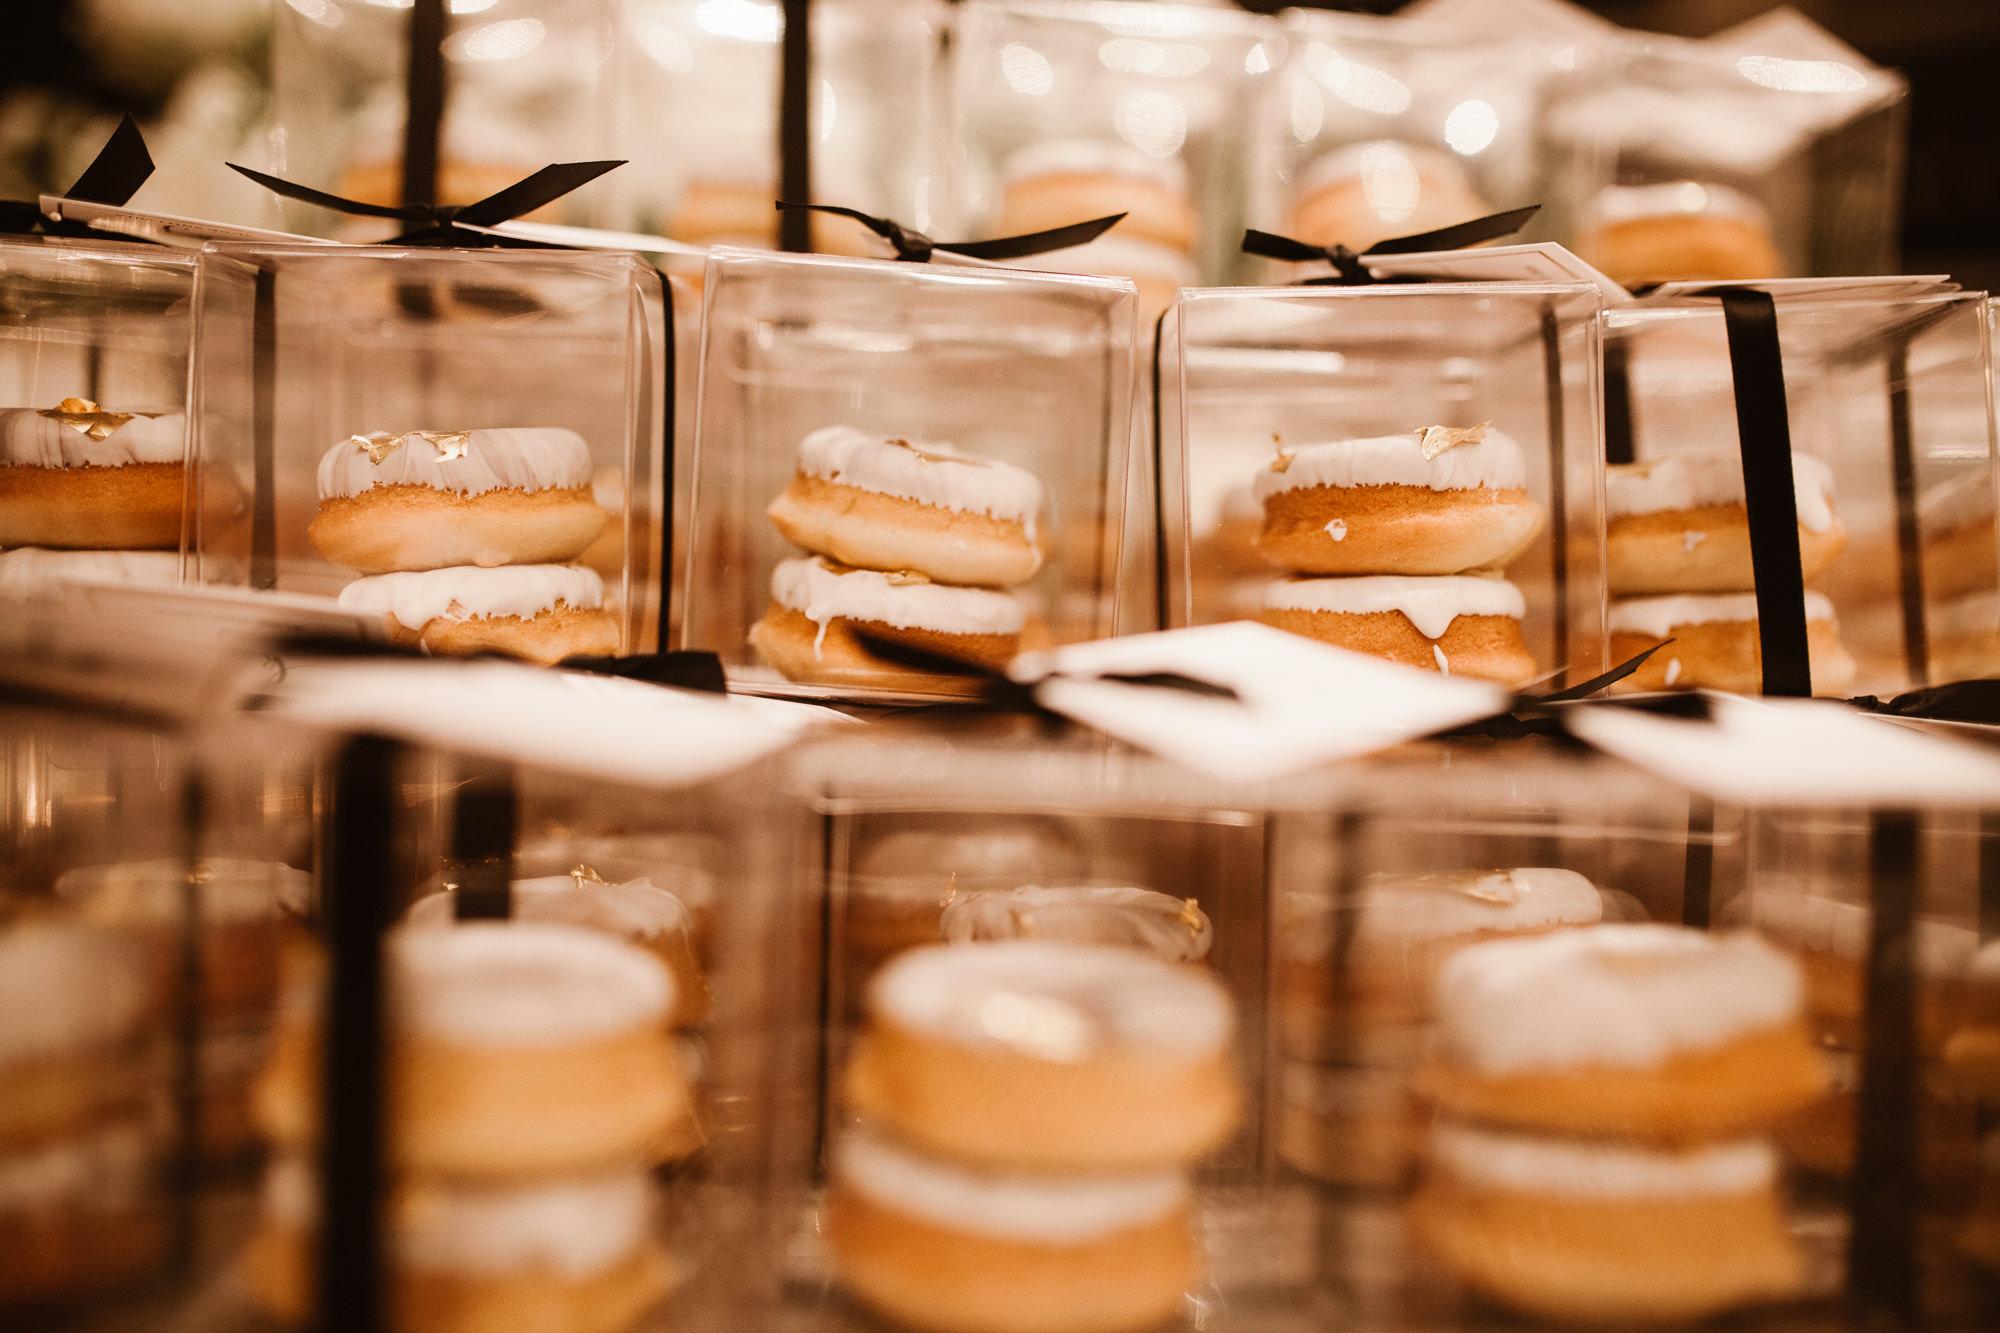 stratus-winery-wedding-vineyard-wedding-vineyard-bride-photo-by-reed-photography-052.jpg